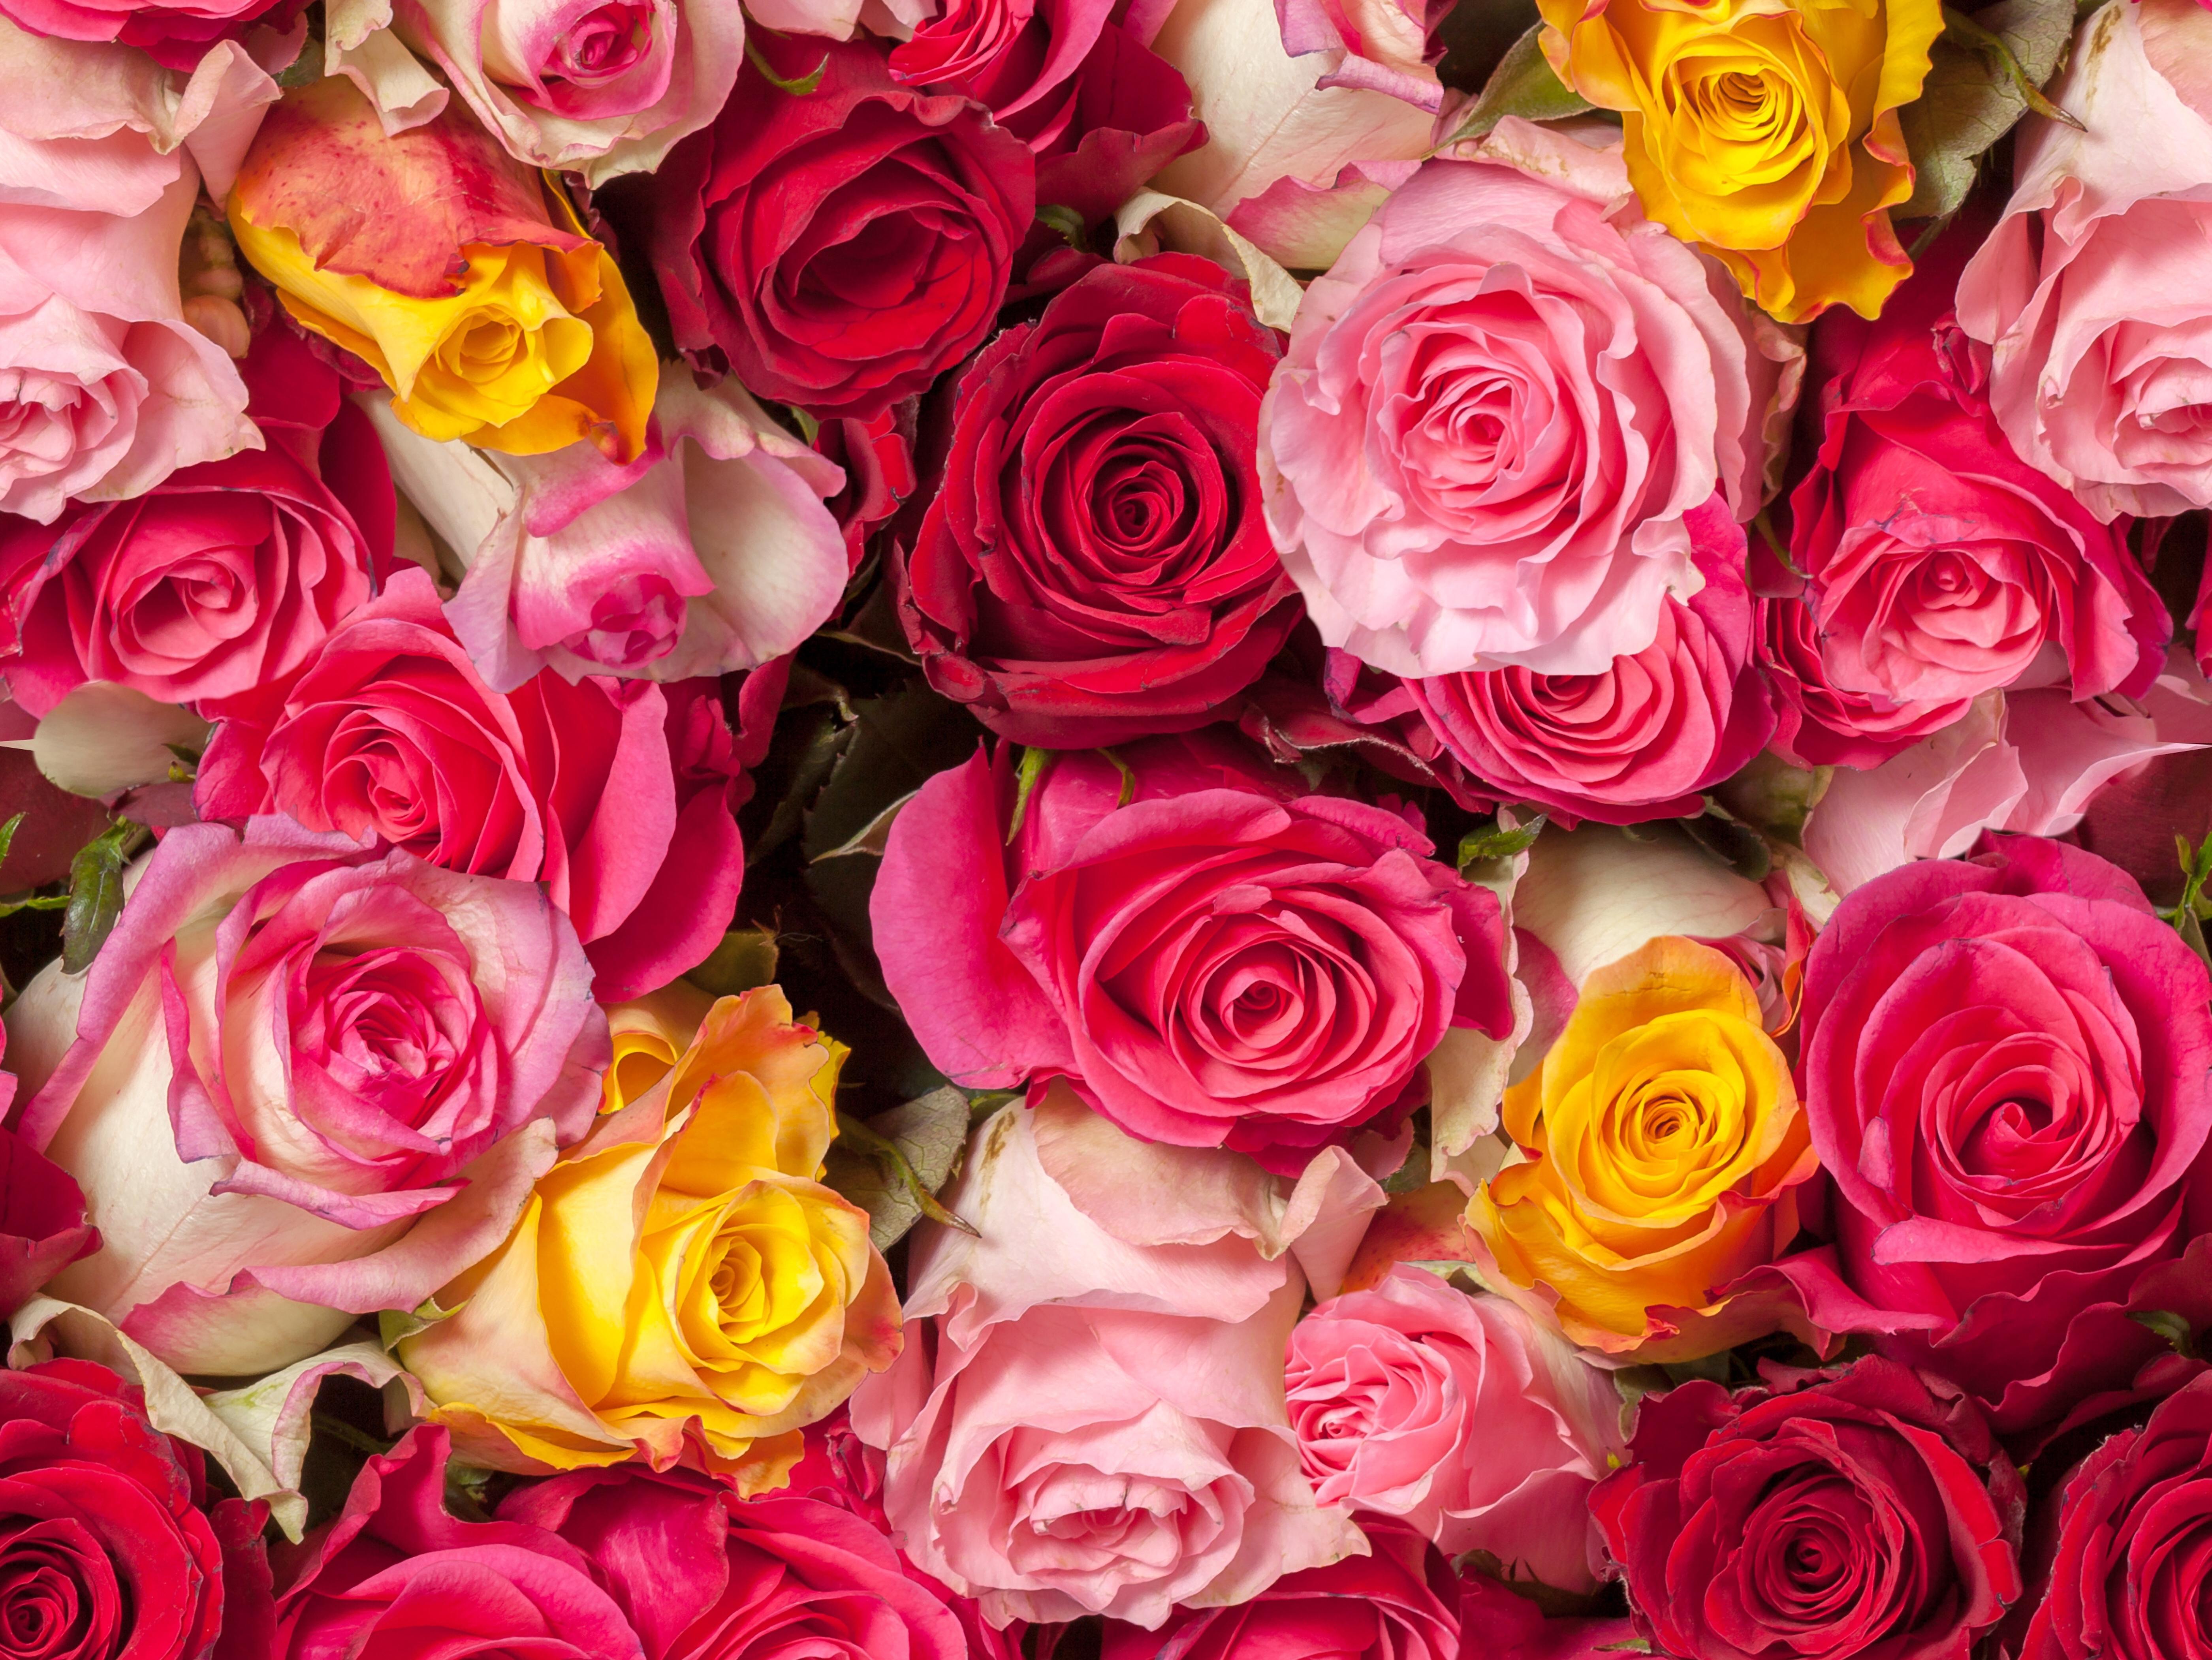 Roses 5k retina ultra hd wallpaper background image - Big rose flower wallpaper ...